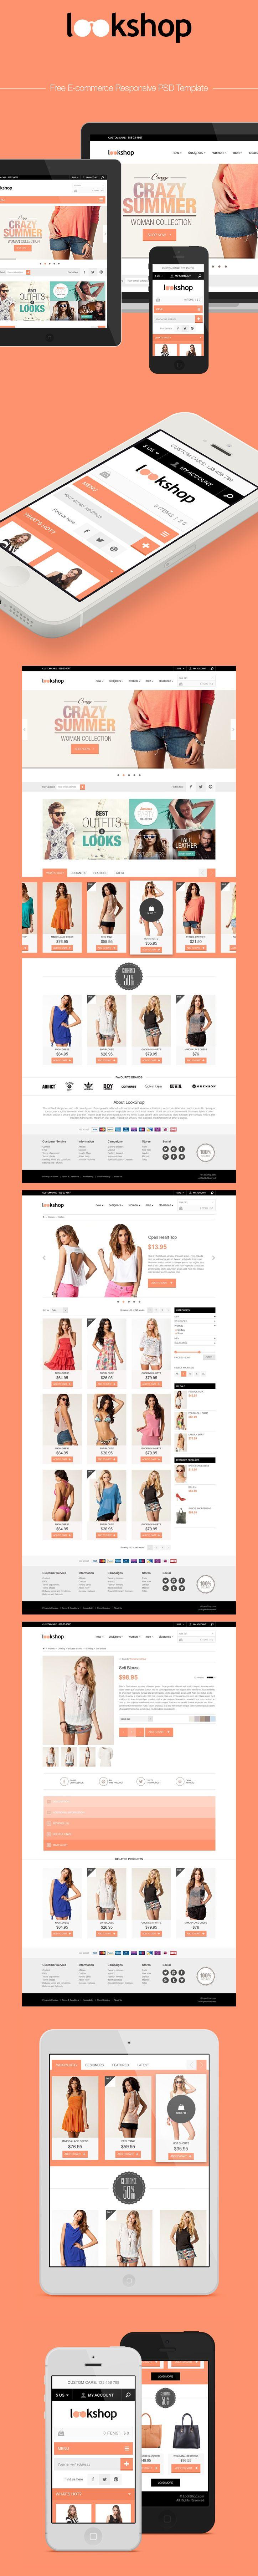 LookShop - Free Responsive PSD Template | Free PSD Templates ...